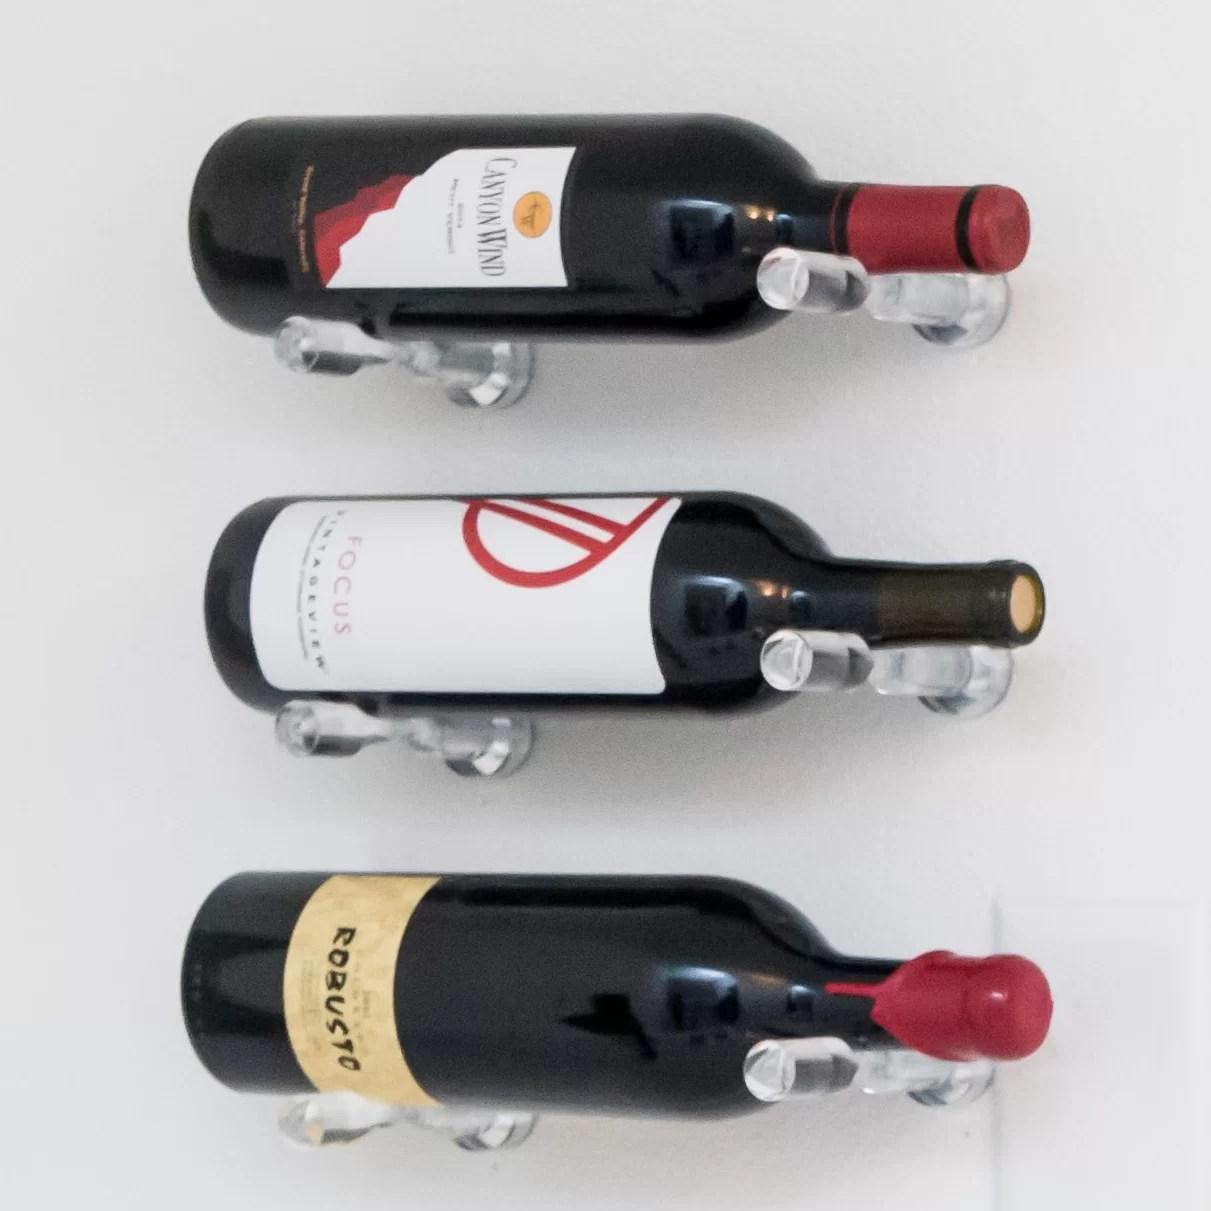 vino pin 1 bottle